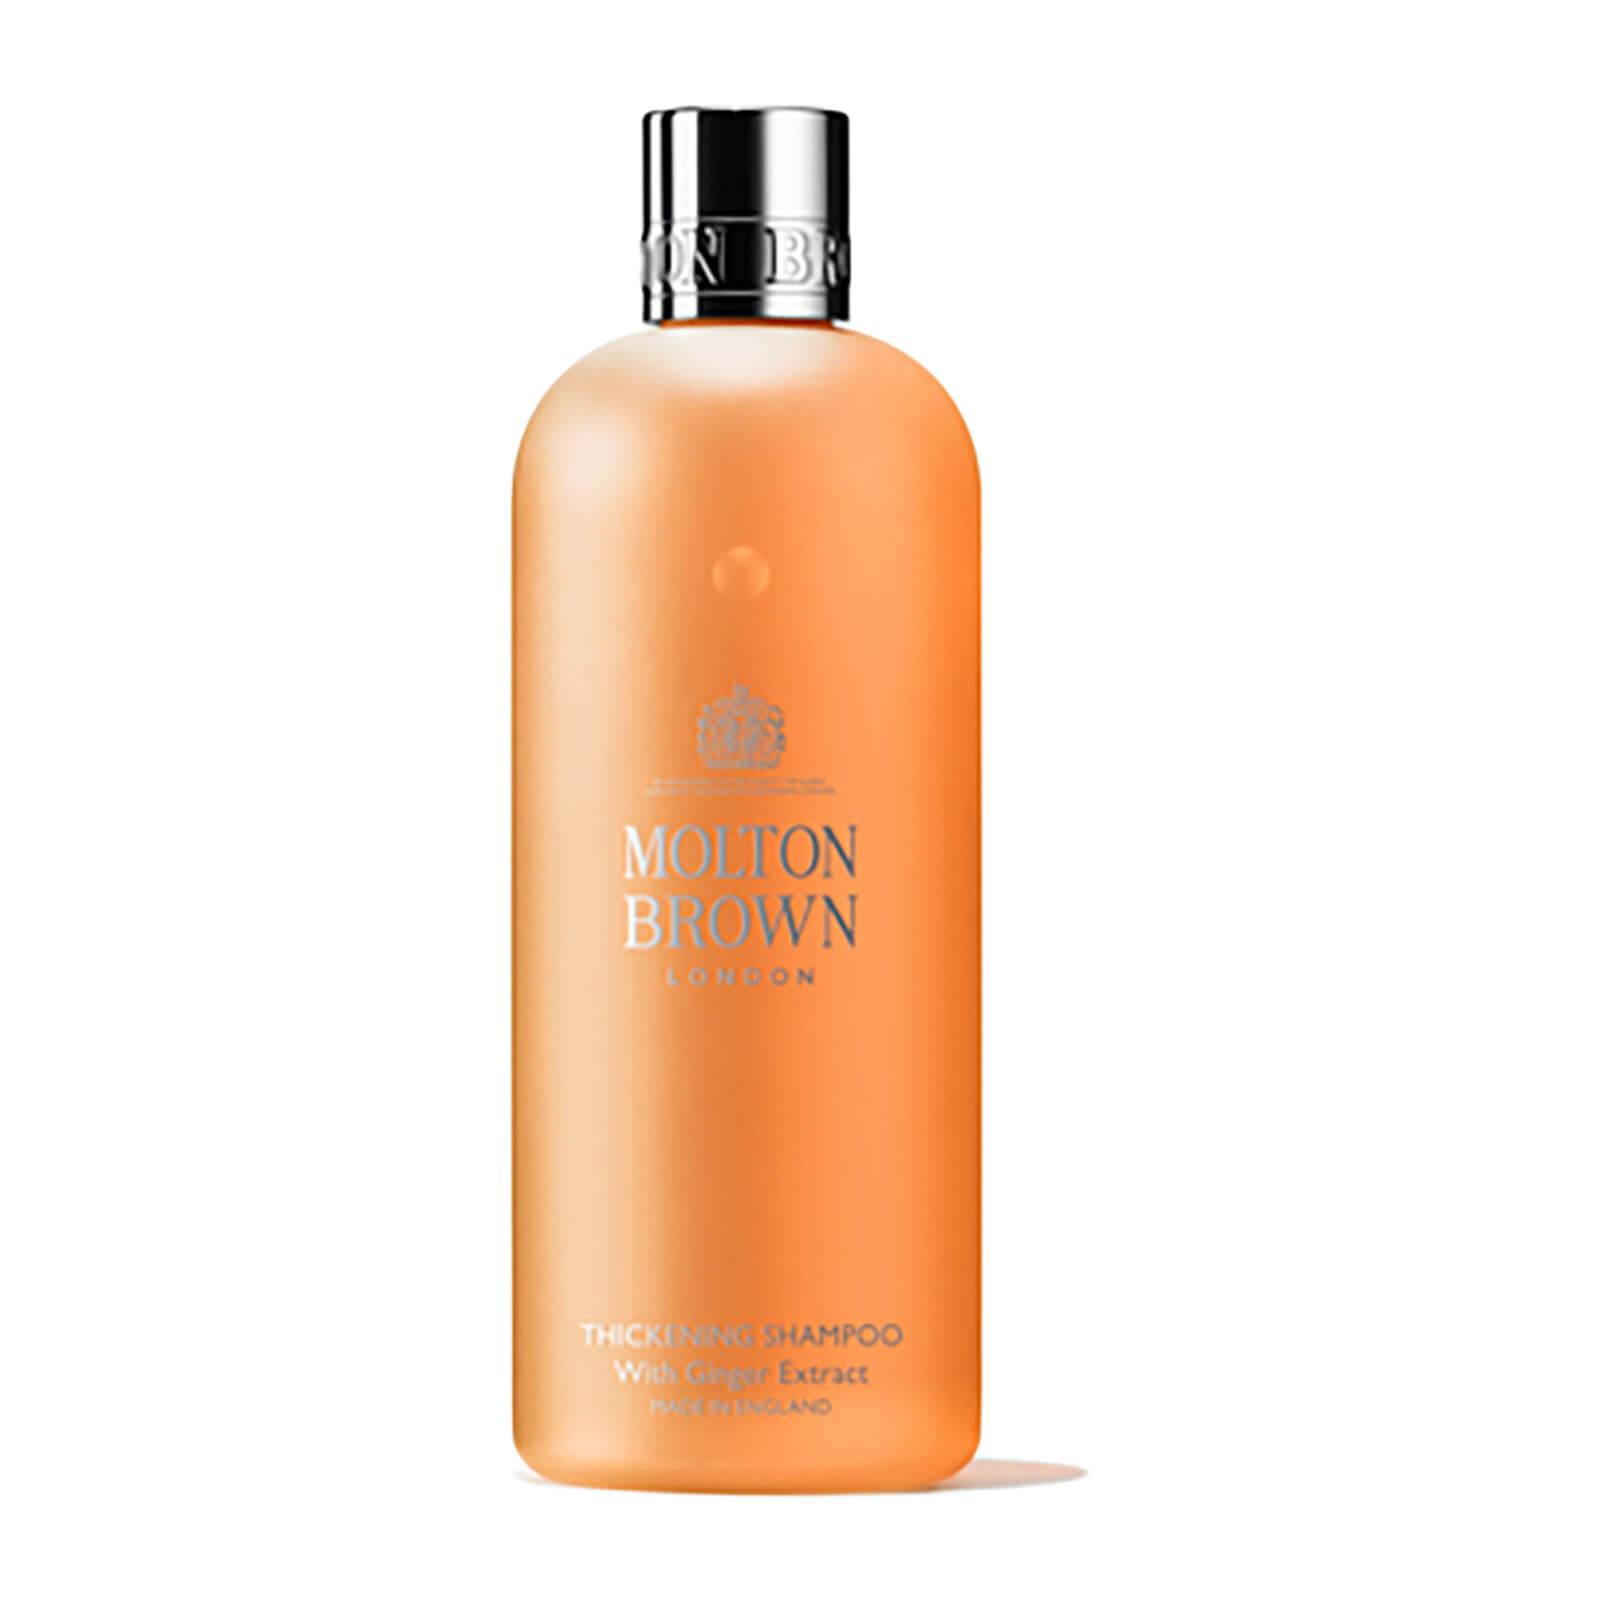 Molton Brown  摩顿布朗 生姜精华丰盈洗发水 300ml